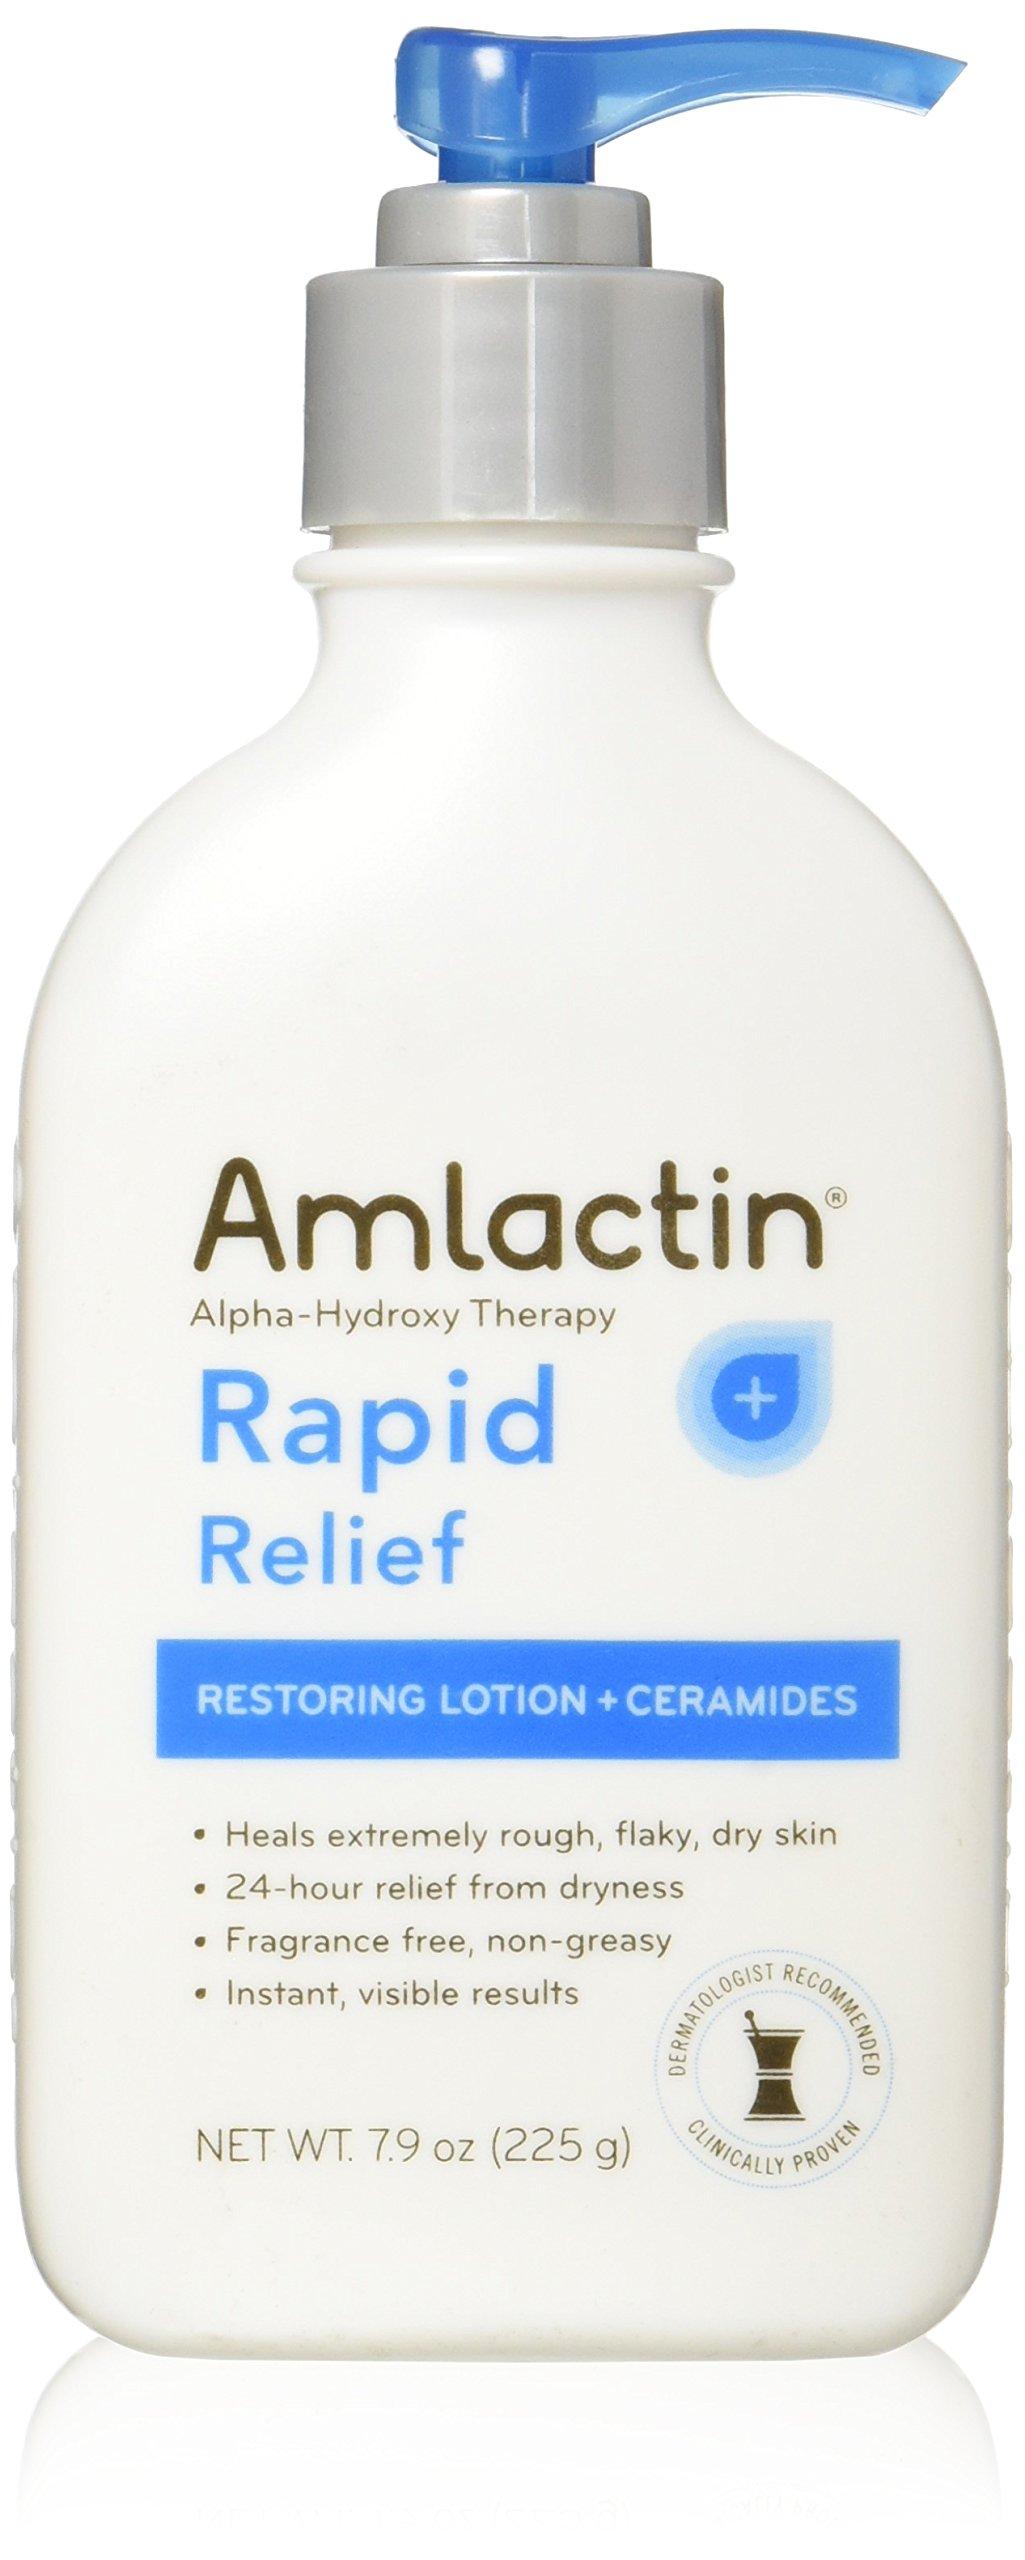 AMLACTIN Alpha-Hydroxy Ceramide Therapy Restoring Lotion, Fragrance Free 7.9 oz